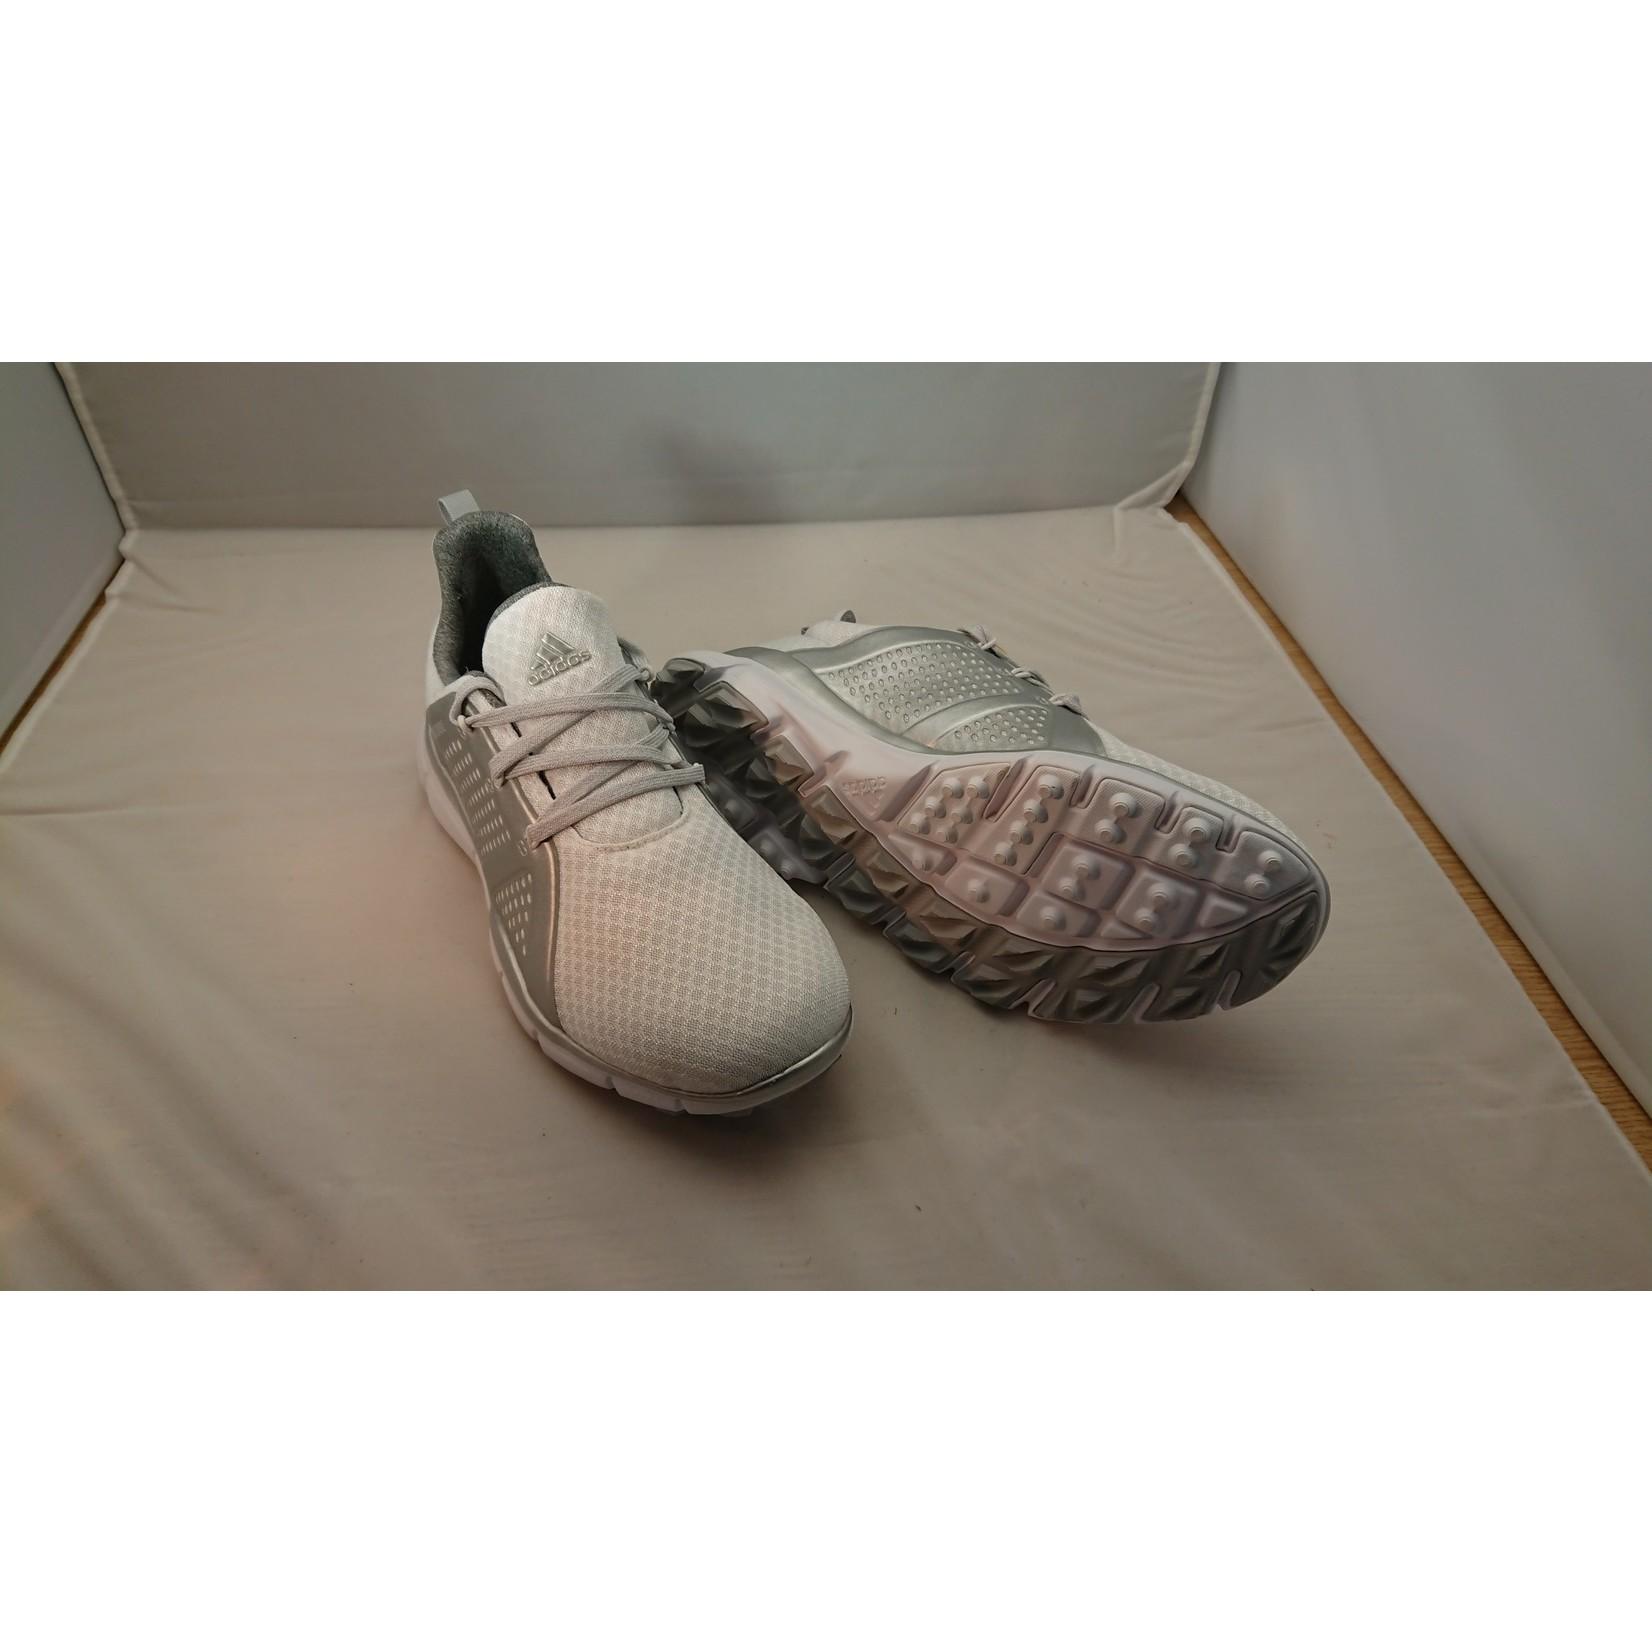 Adidas Adidias W Climacool Cage Wit 39 1/3